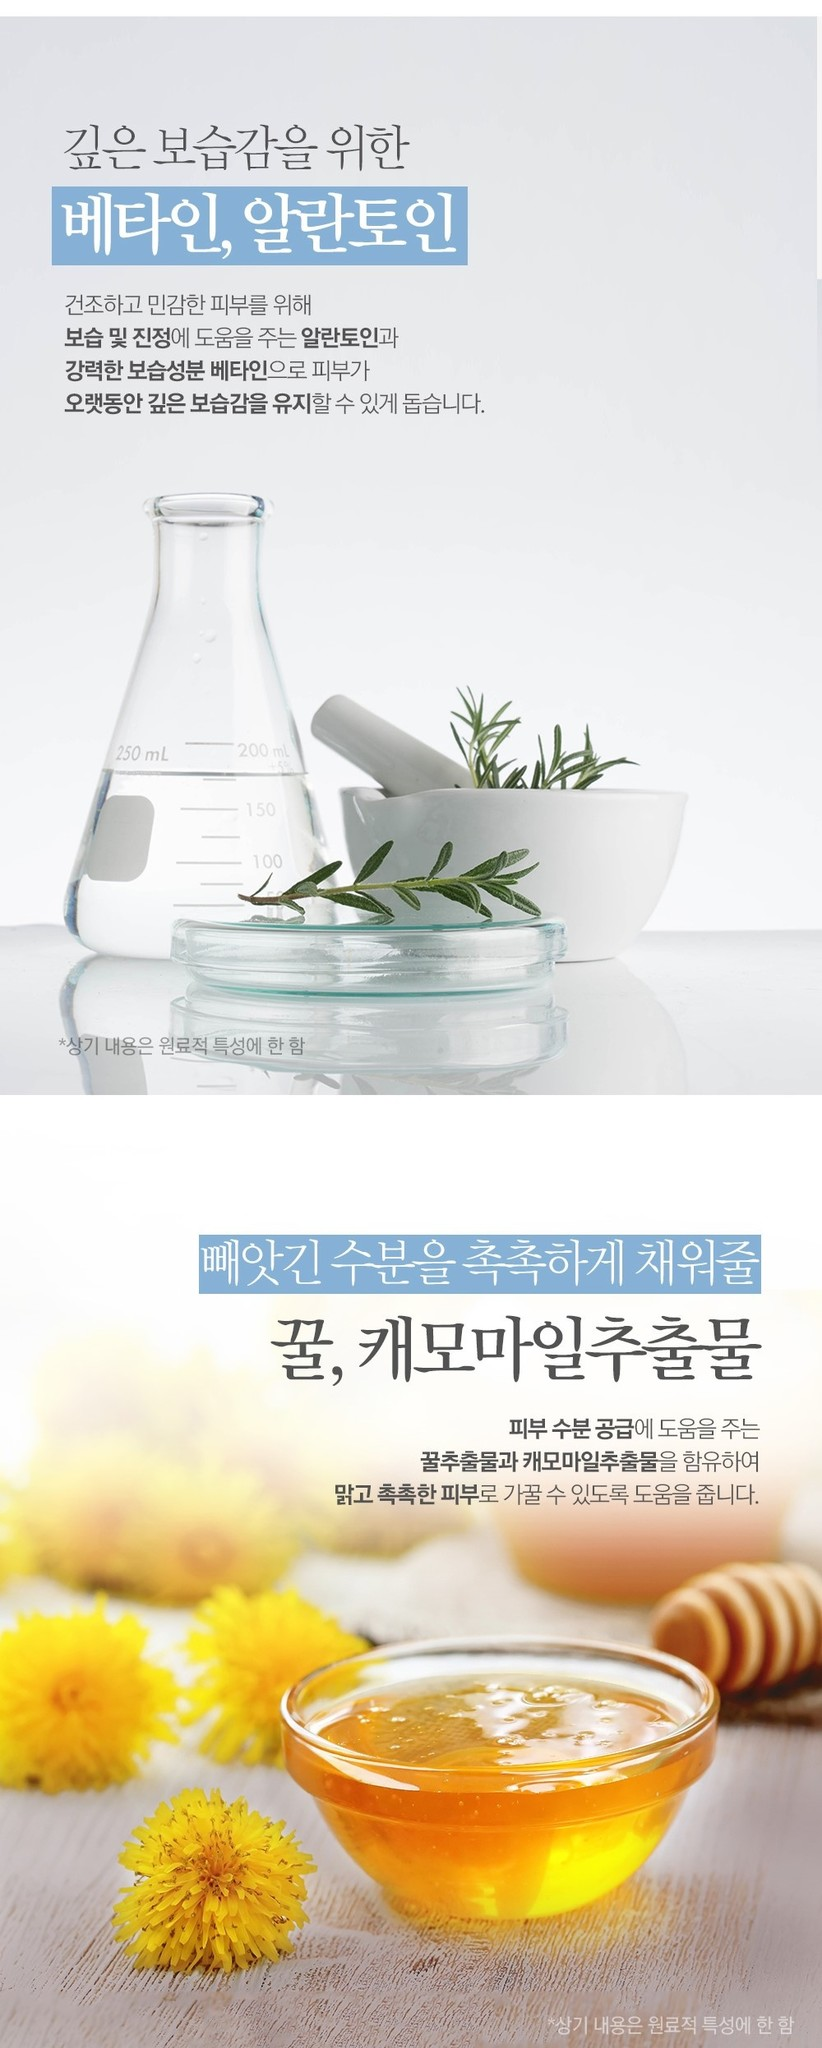 Fragranced Hand Cream (Clean Soap)-4